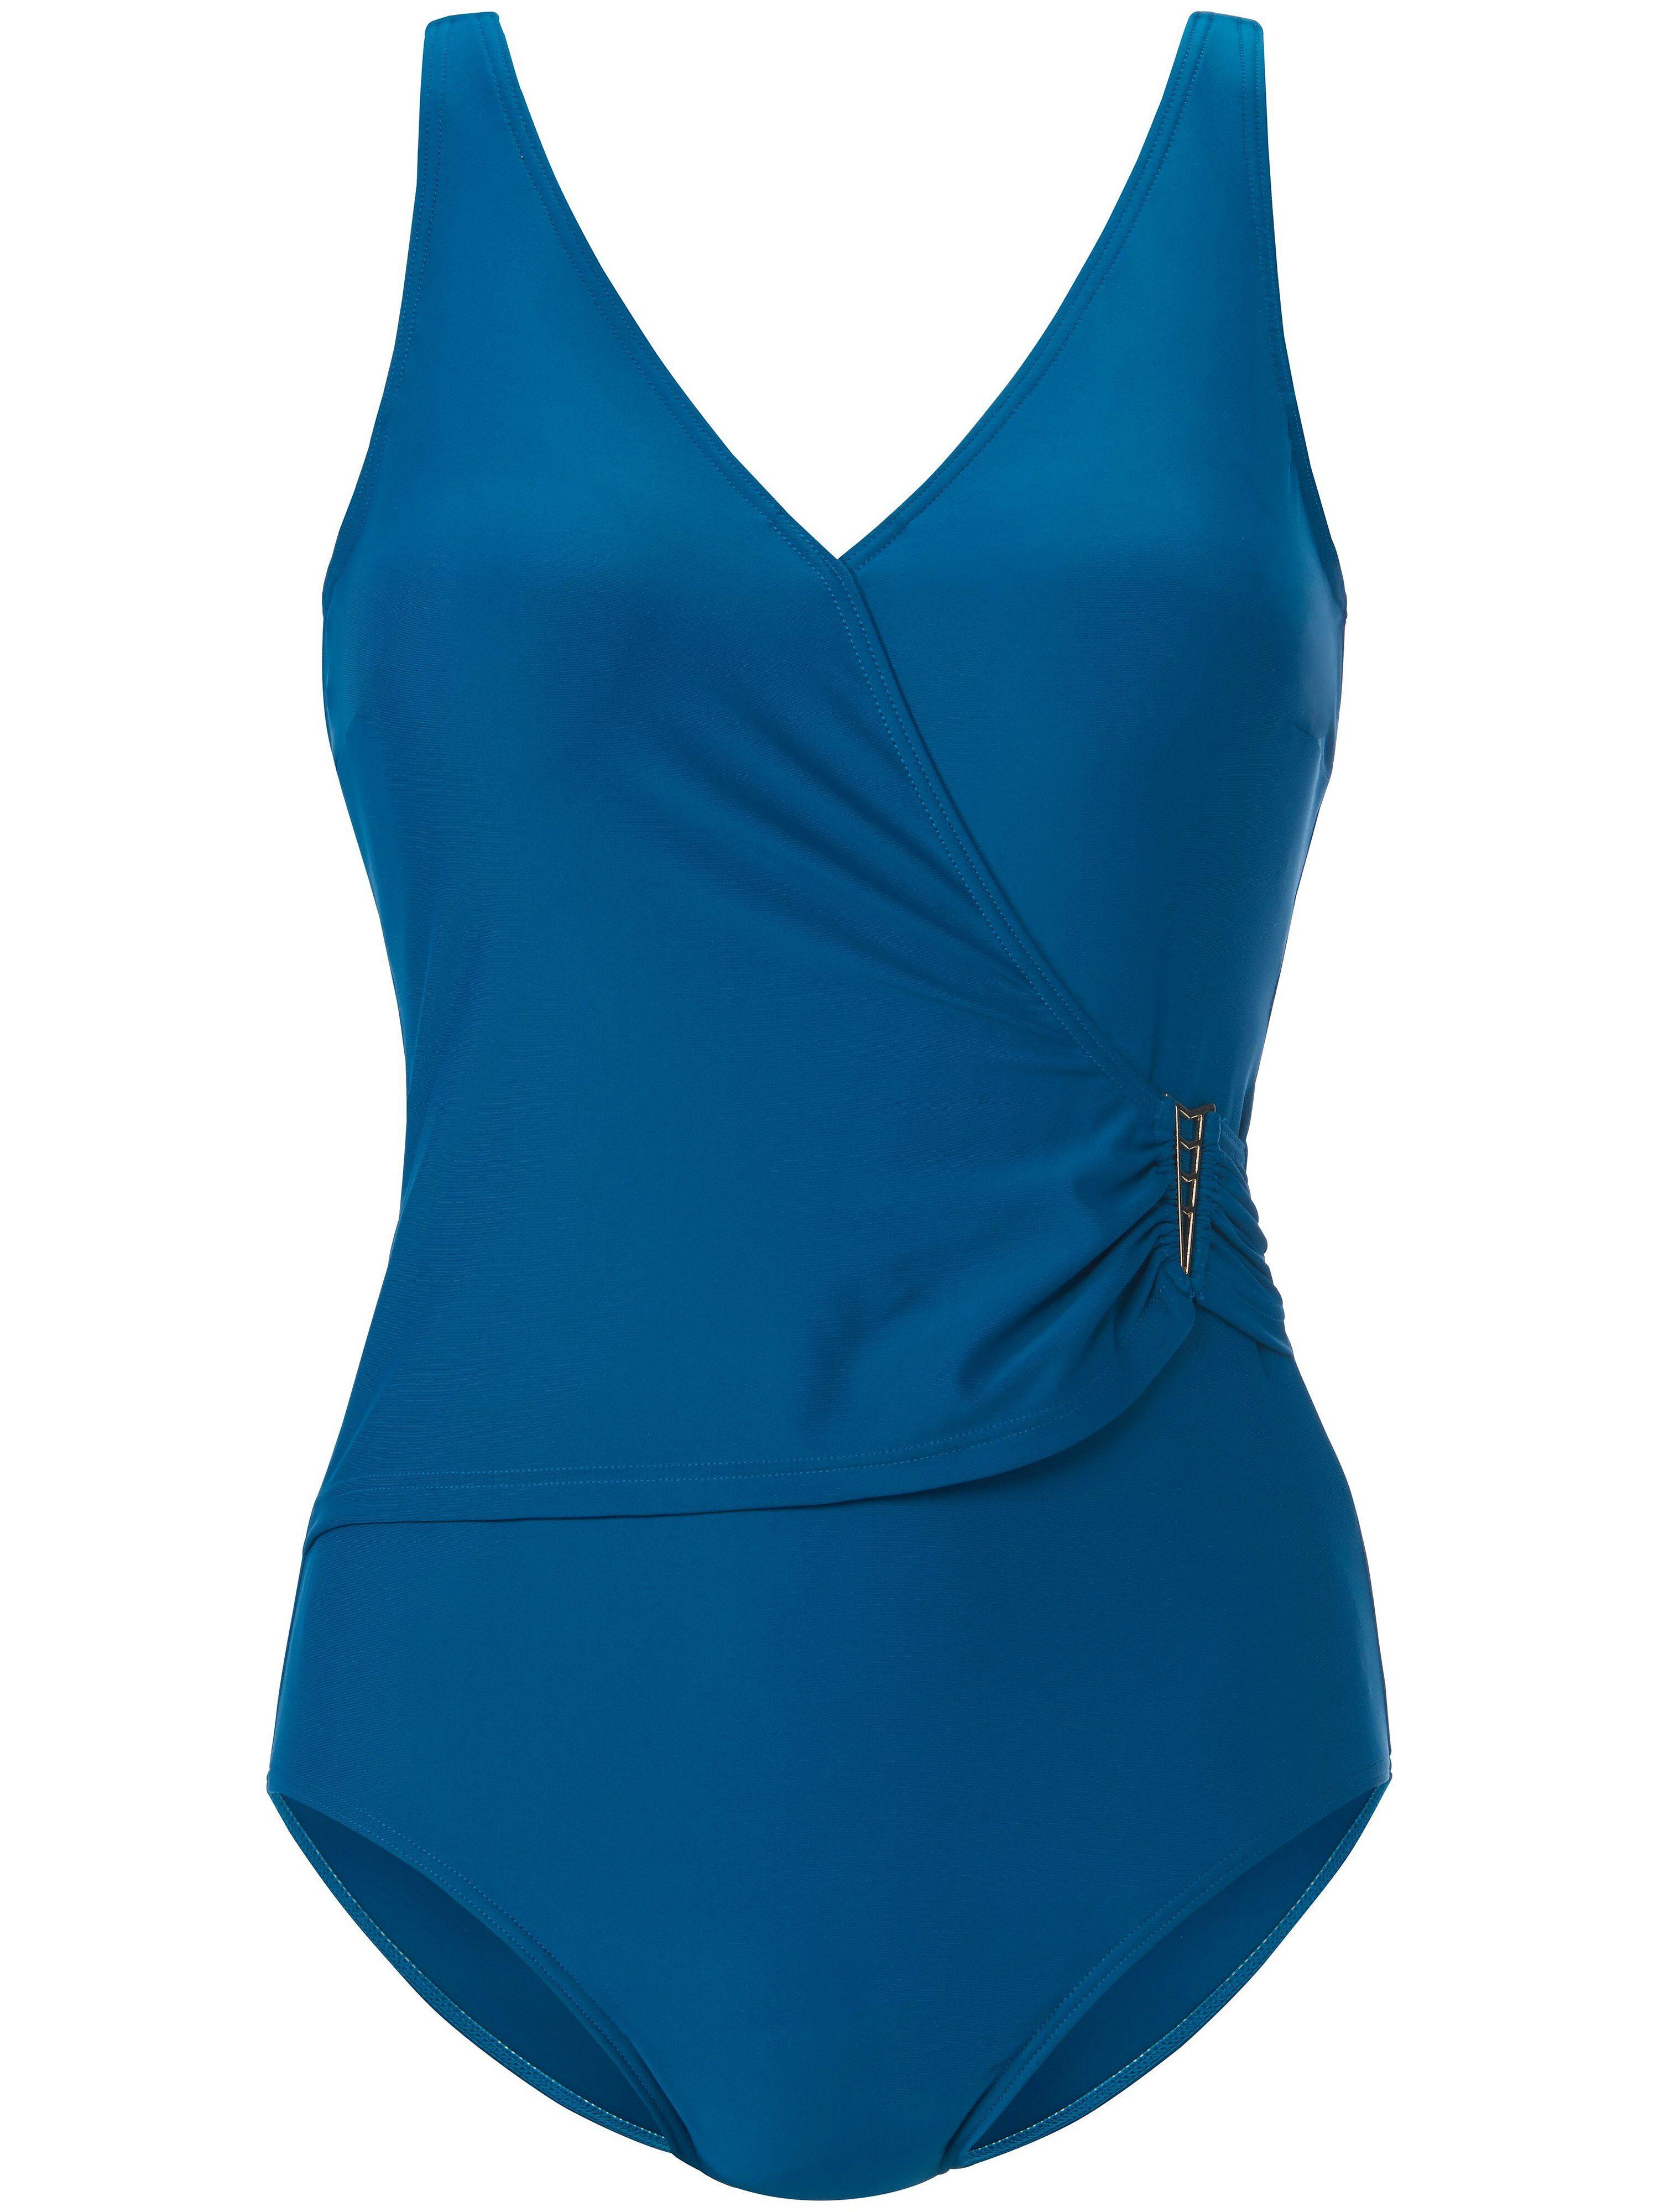 Naturana Le maillot bain semi-bustier style croisé  Naturana turquoise  - Femme - 40